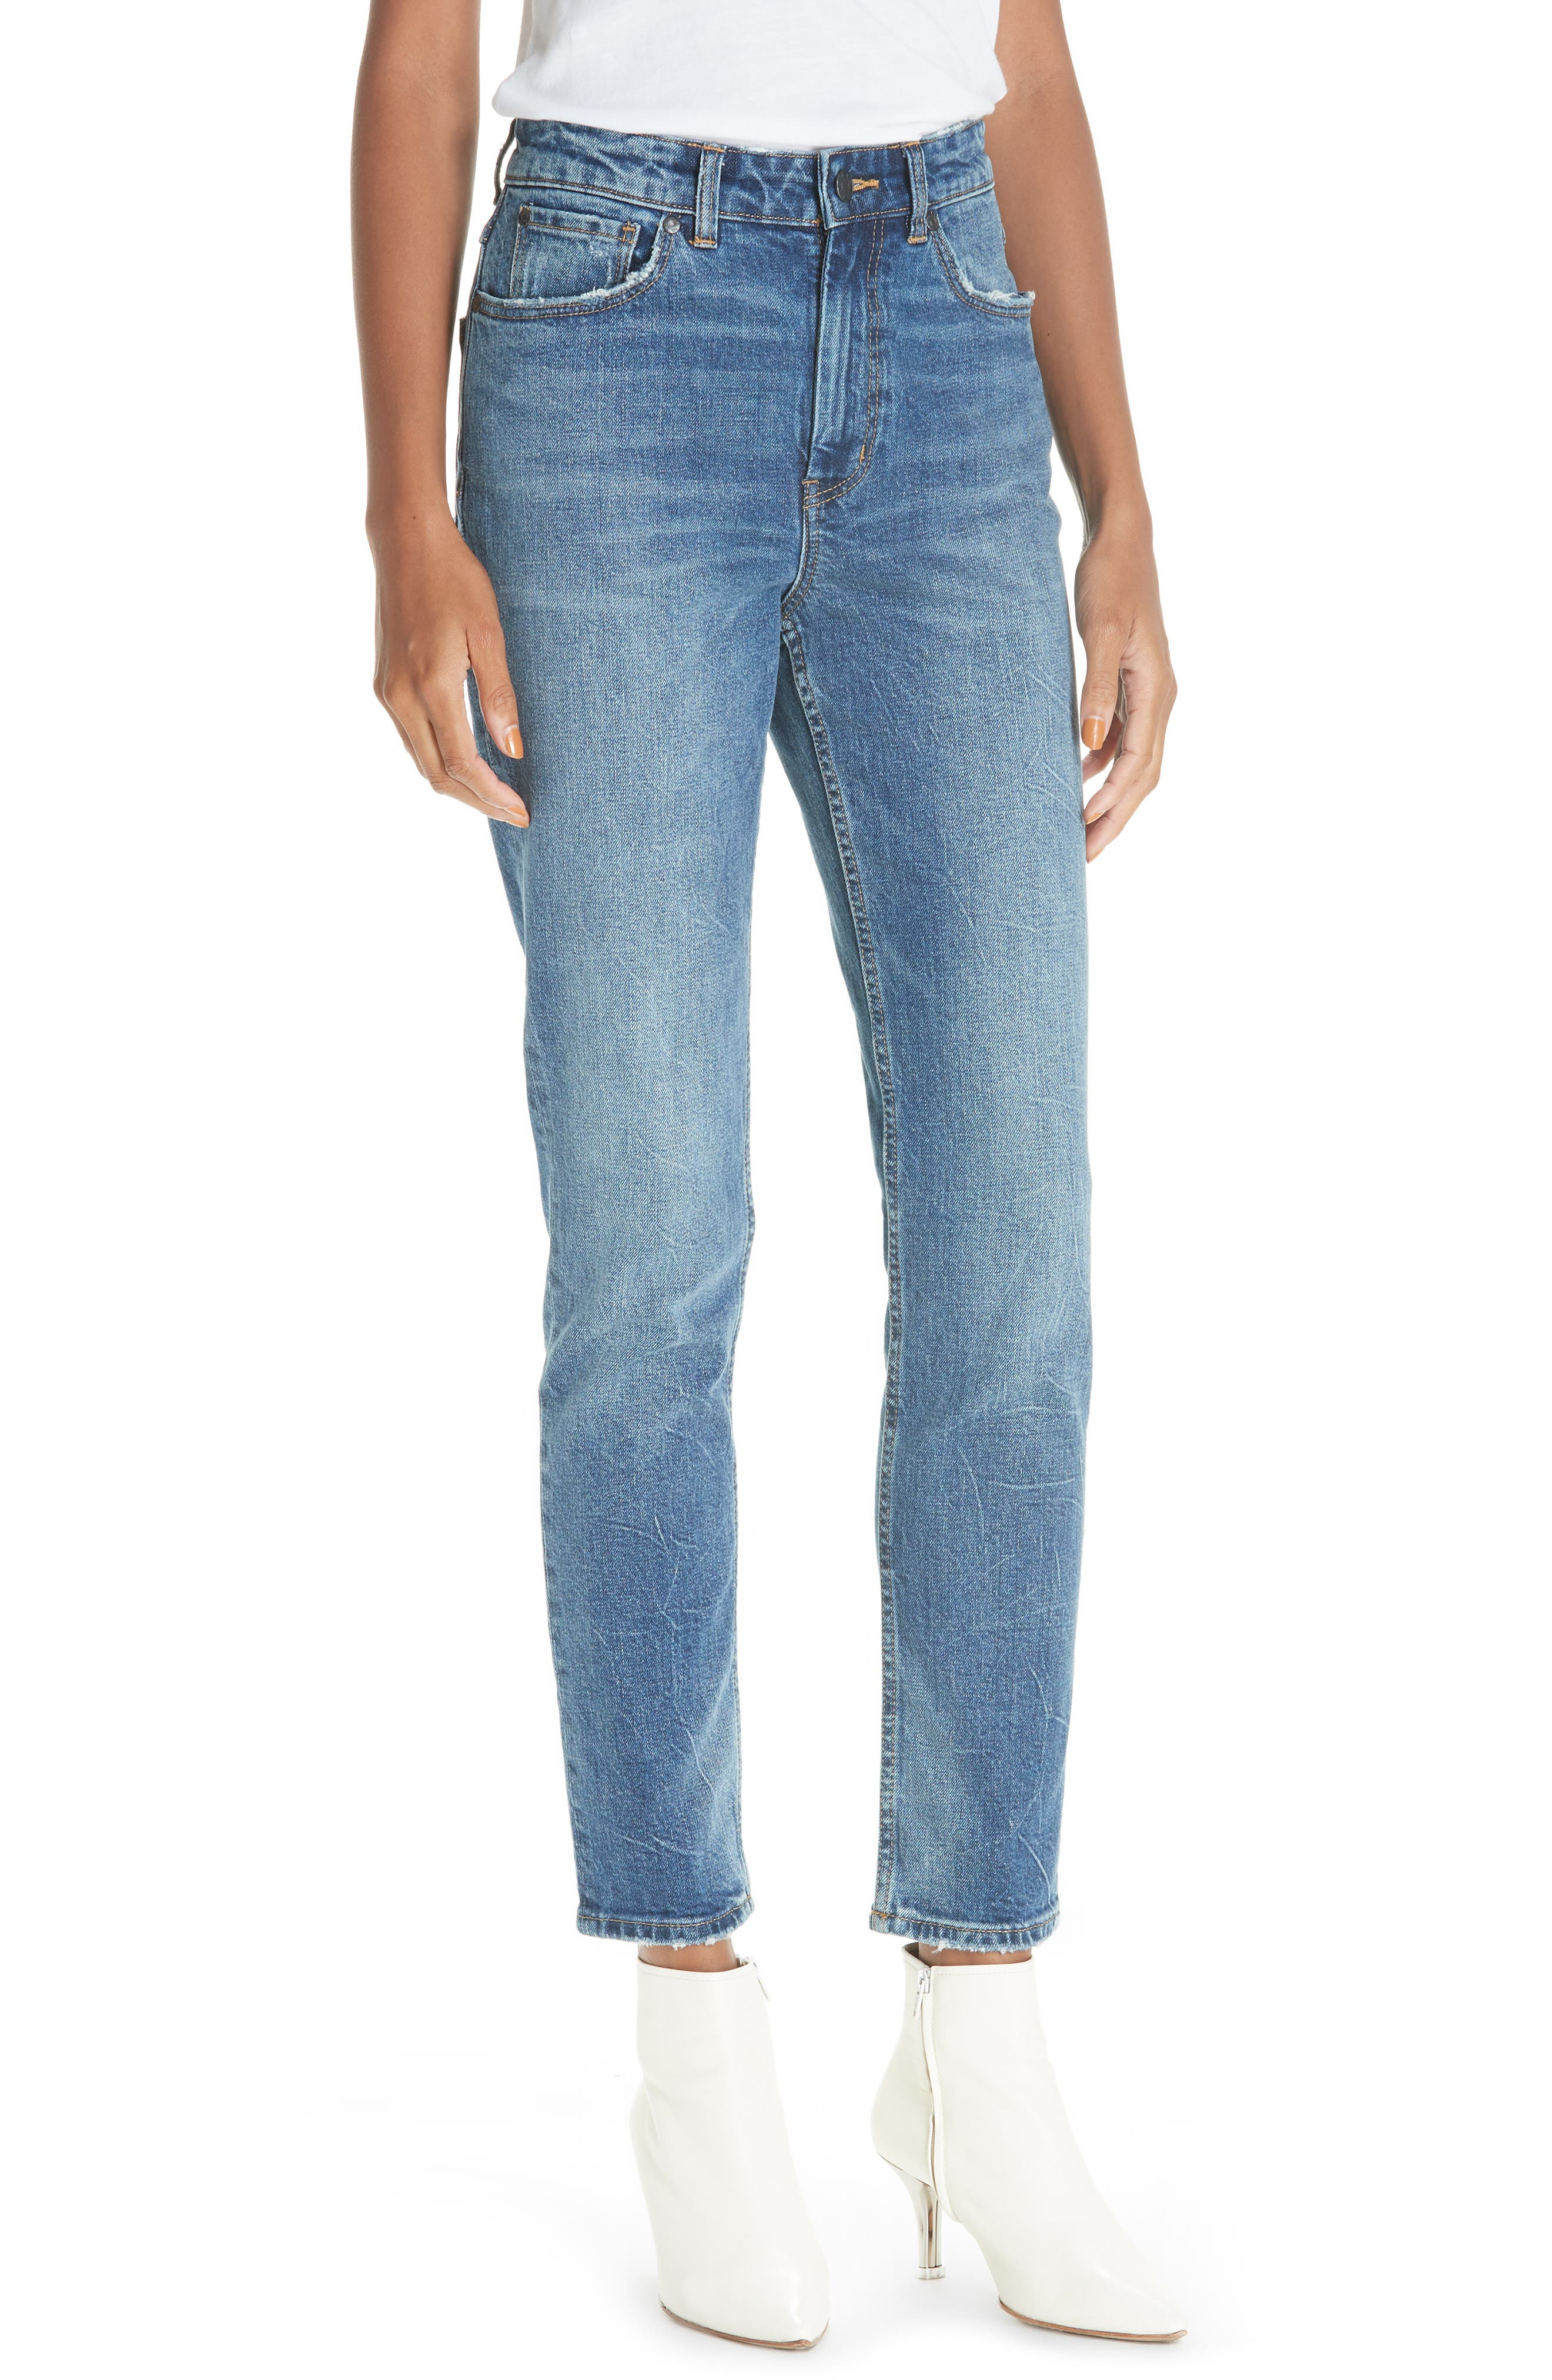 La Vie Rebecca Taylor High Waist Straight Leg Jeans (Garwsh)